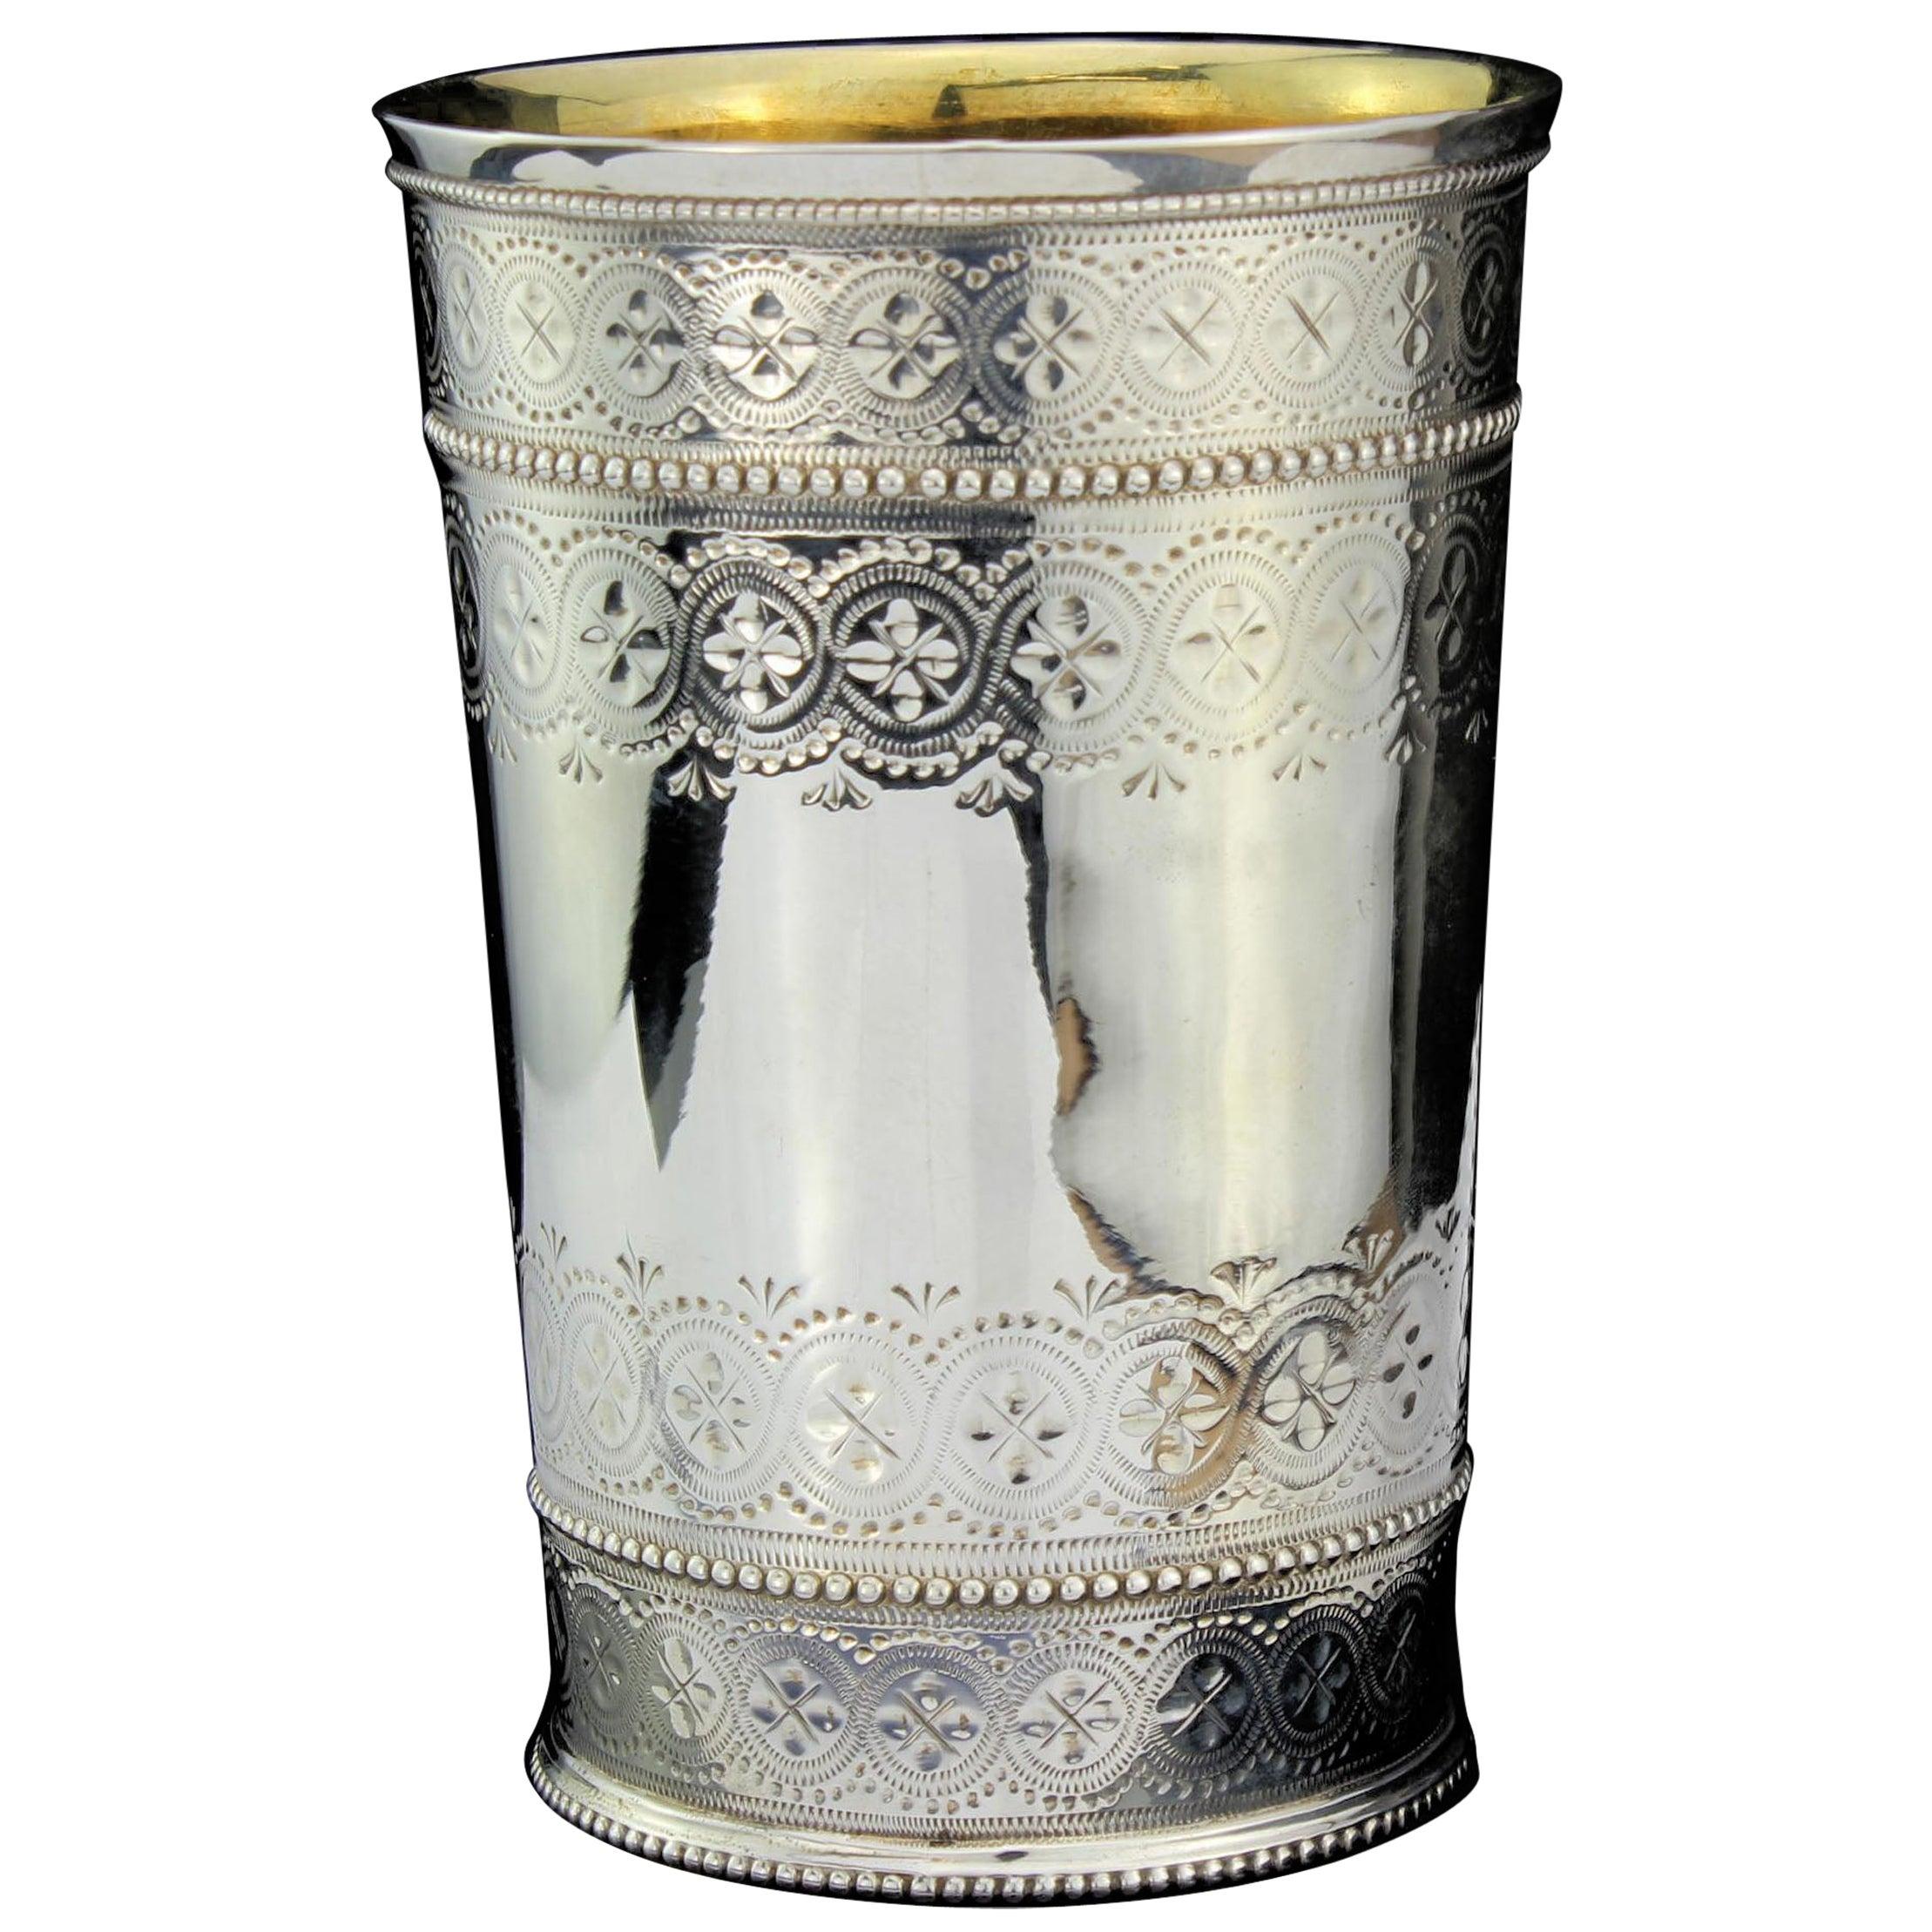 Antique Victorian Sterling Silver Beaker